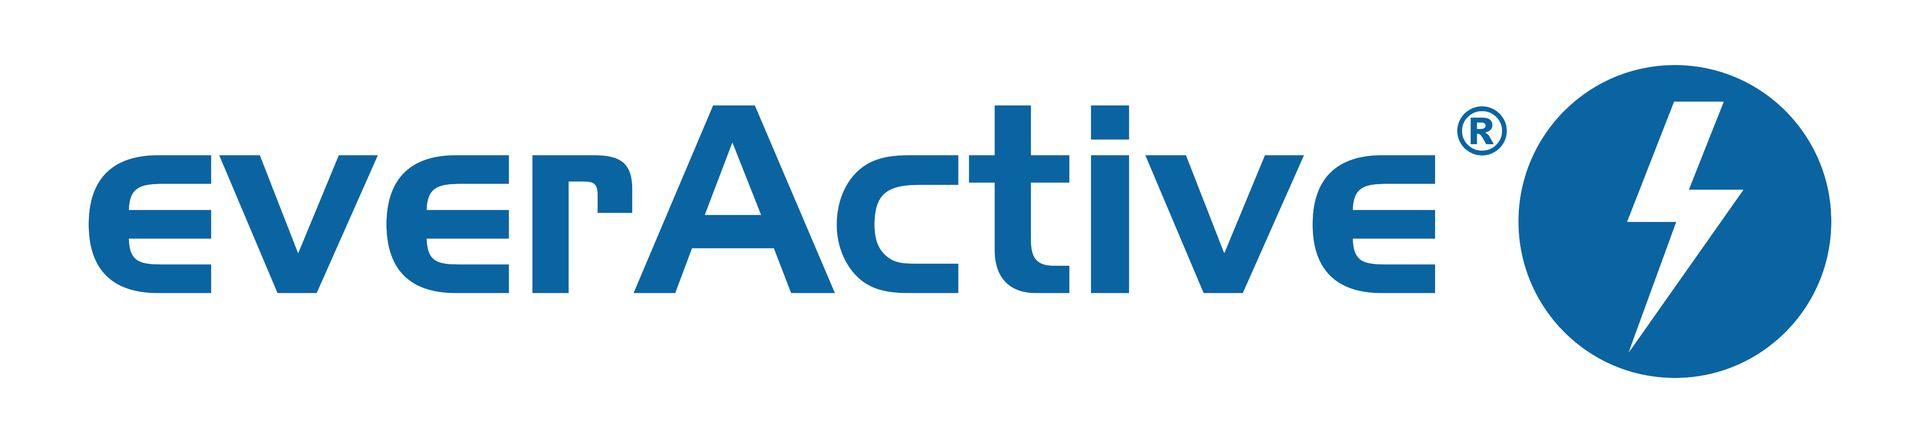 EverActive | baterie, akumulatory i ładowarki